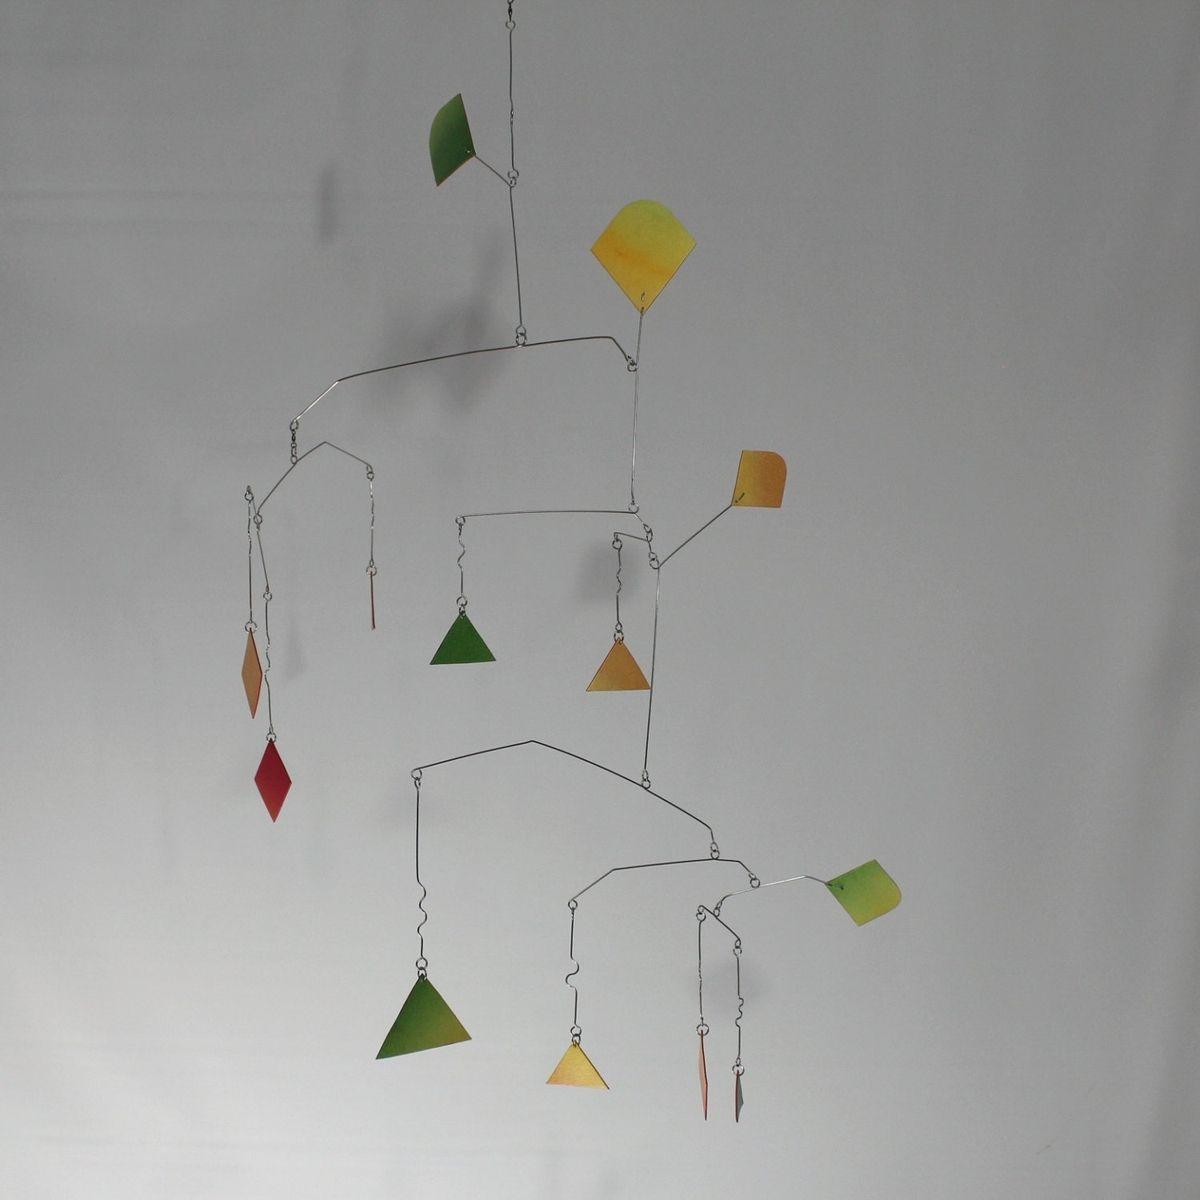 Modern Home Decor Store Handmade Tall Abstract Art Mobile Alien In Rainbow